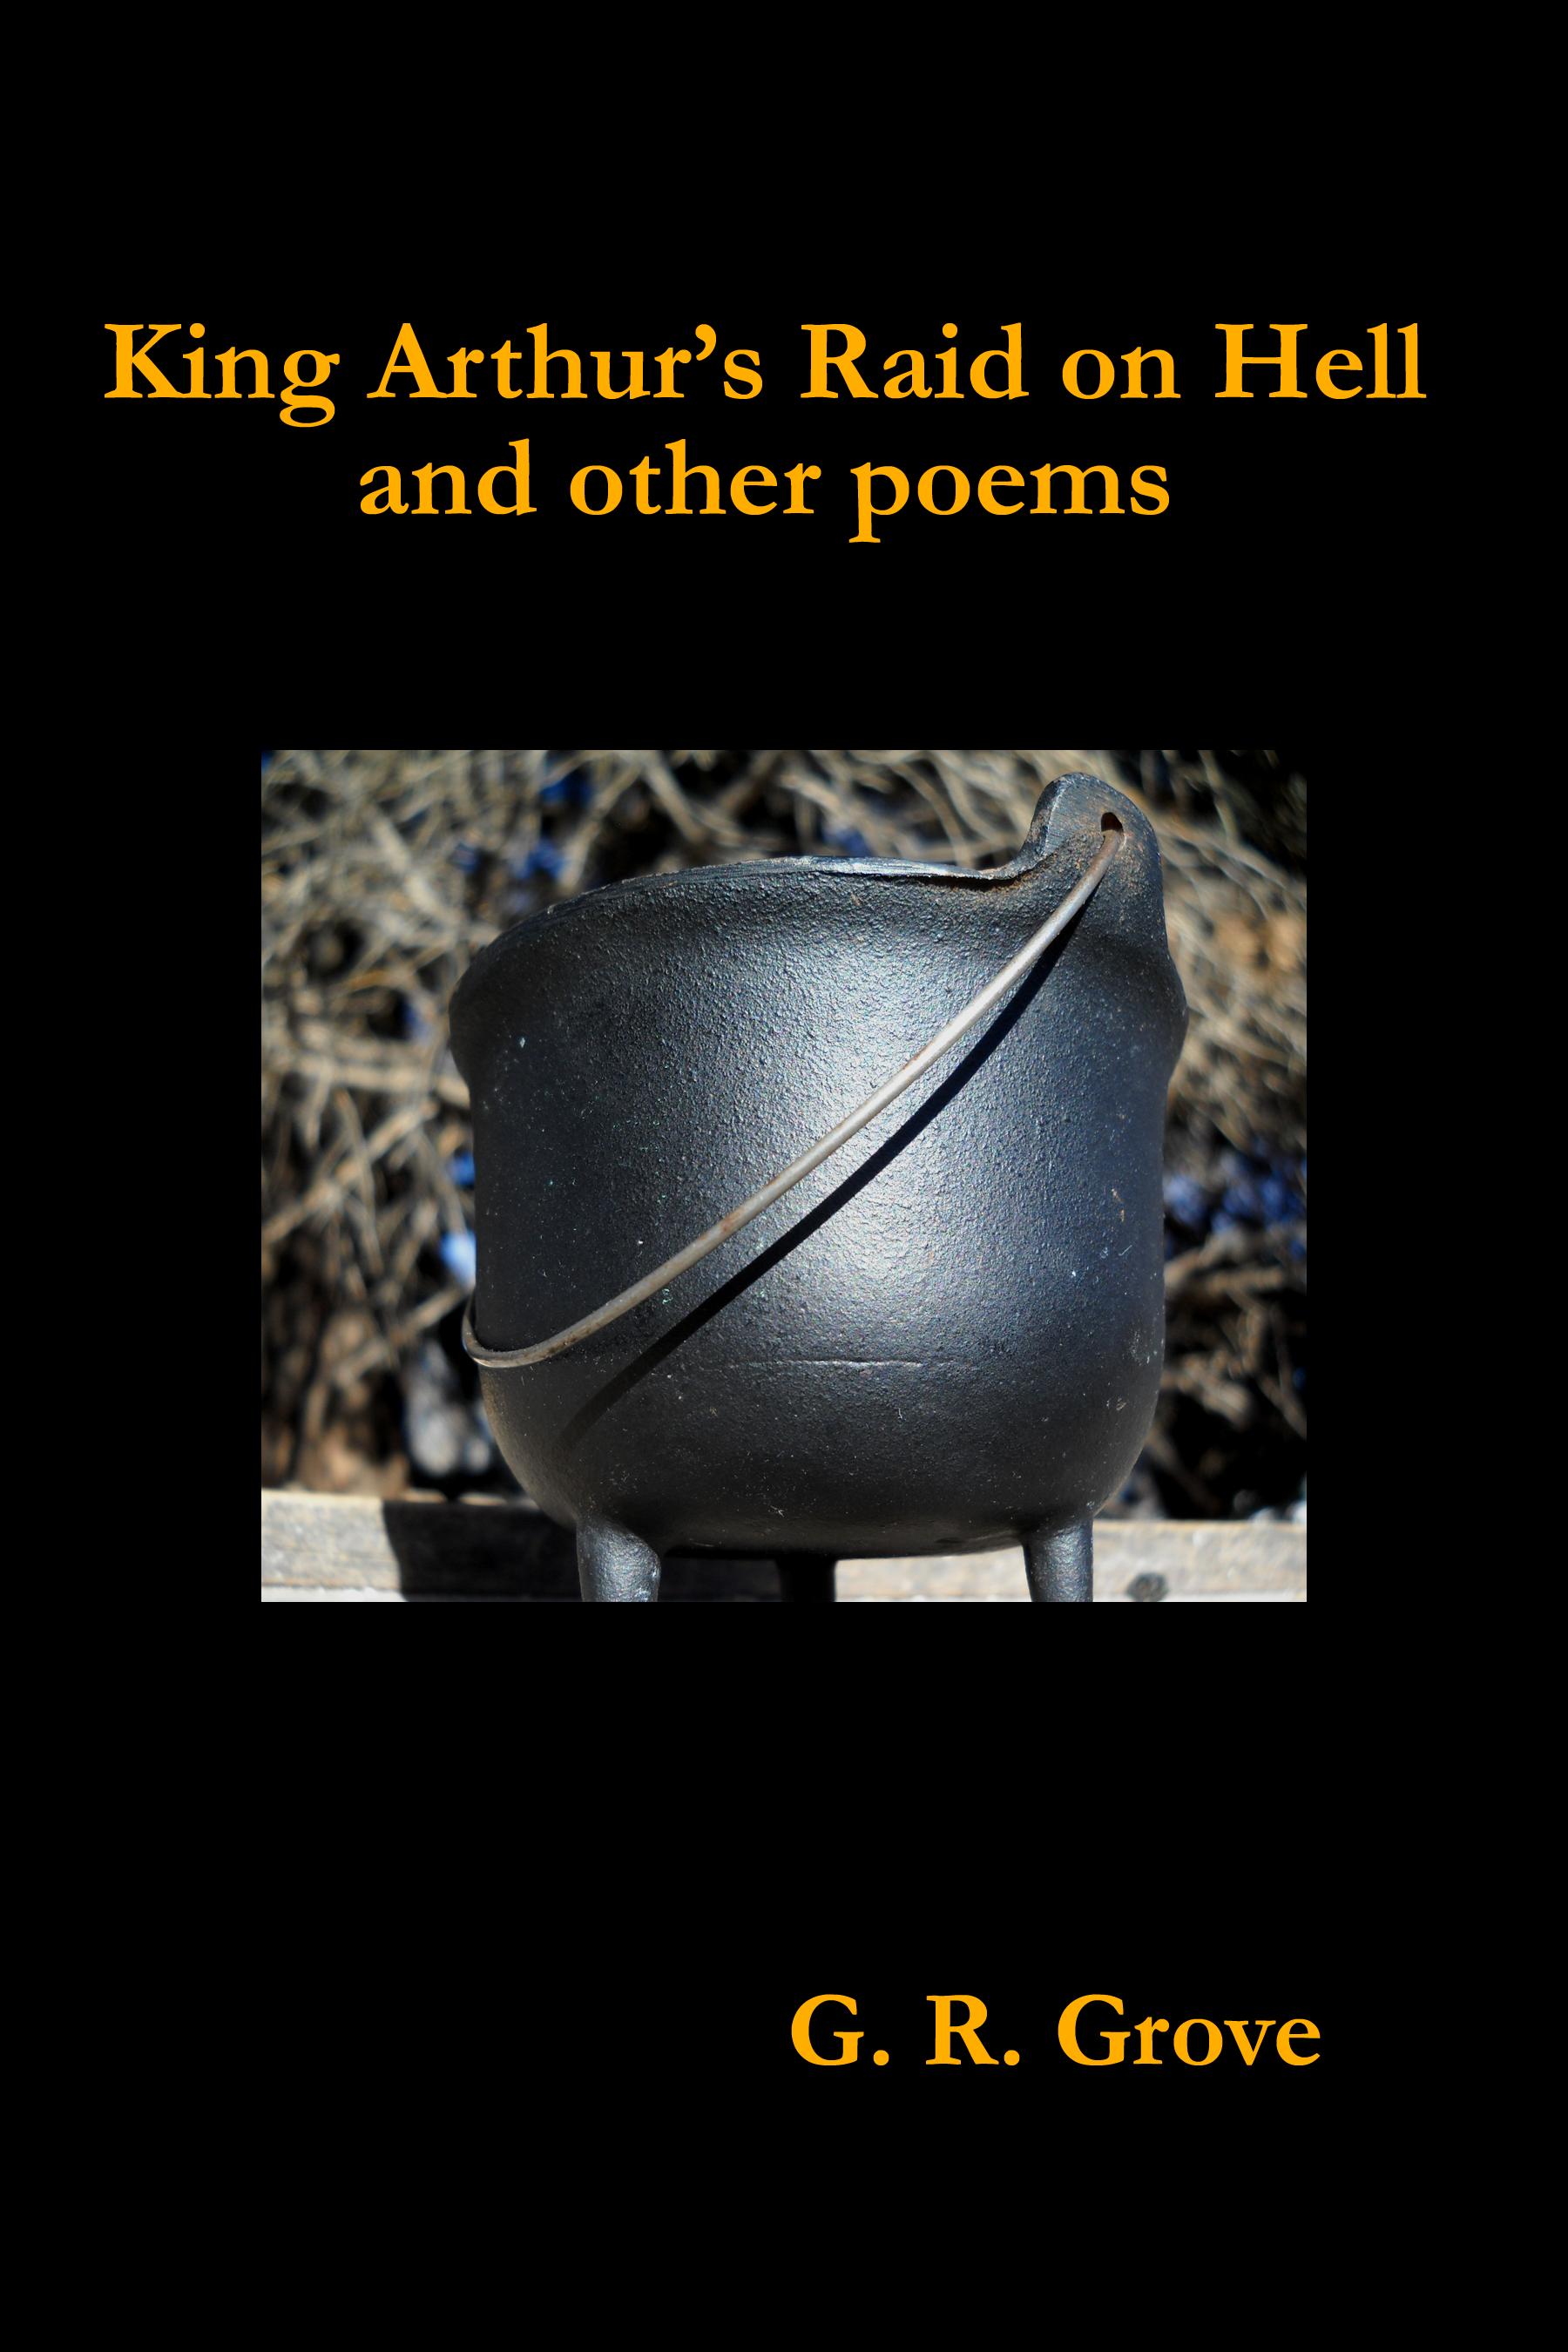 G. R. Grove - King Arthur's Raid on Hell and other poems